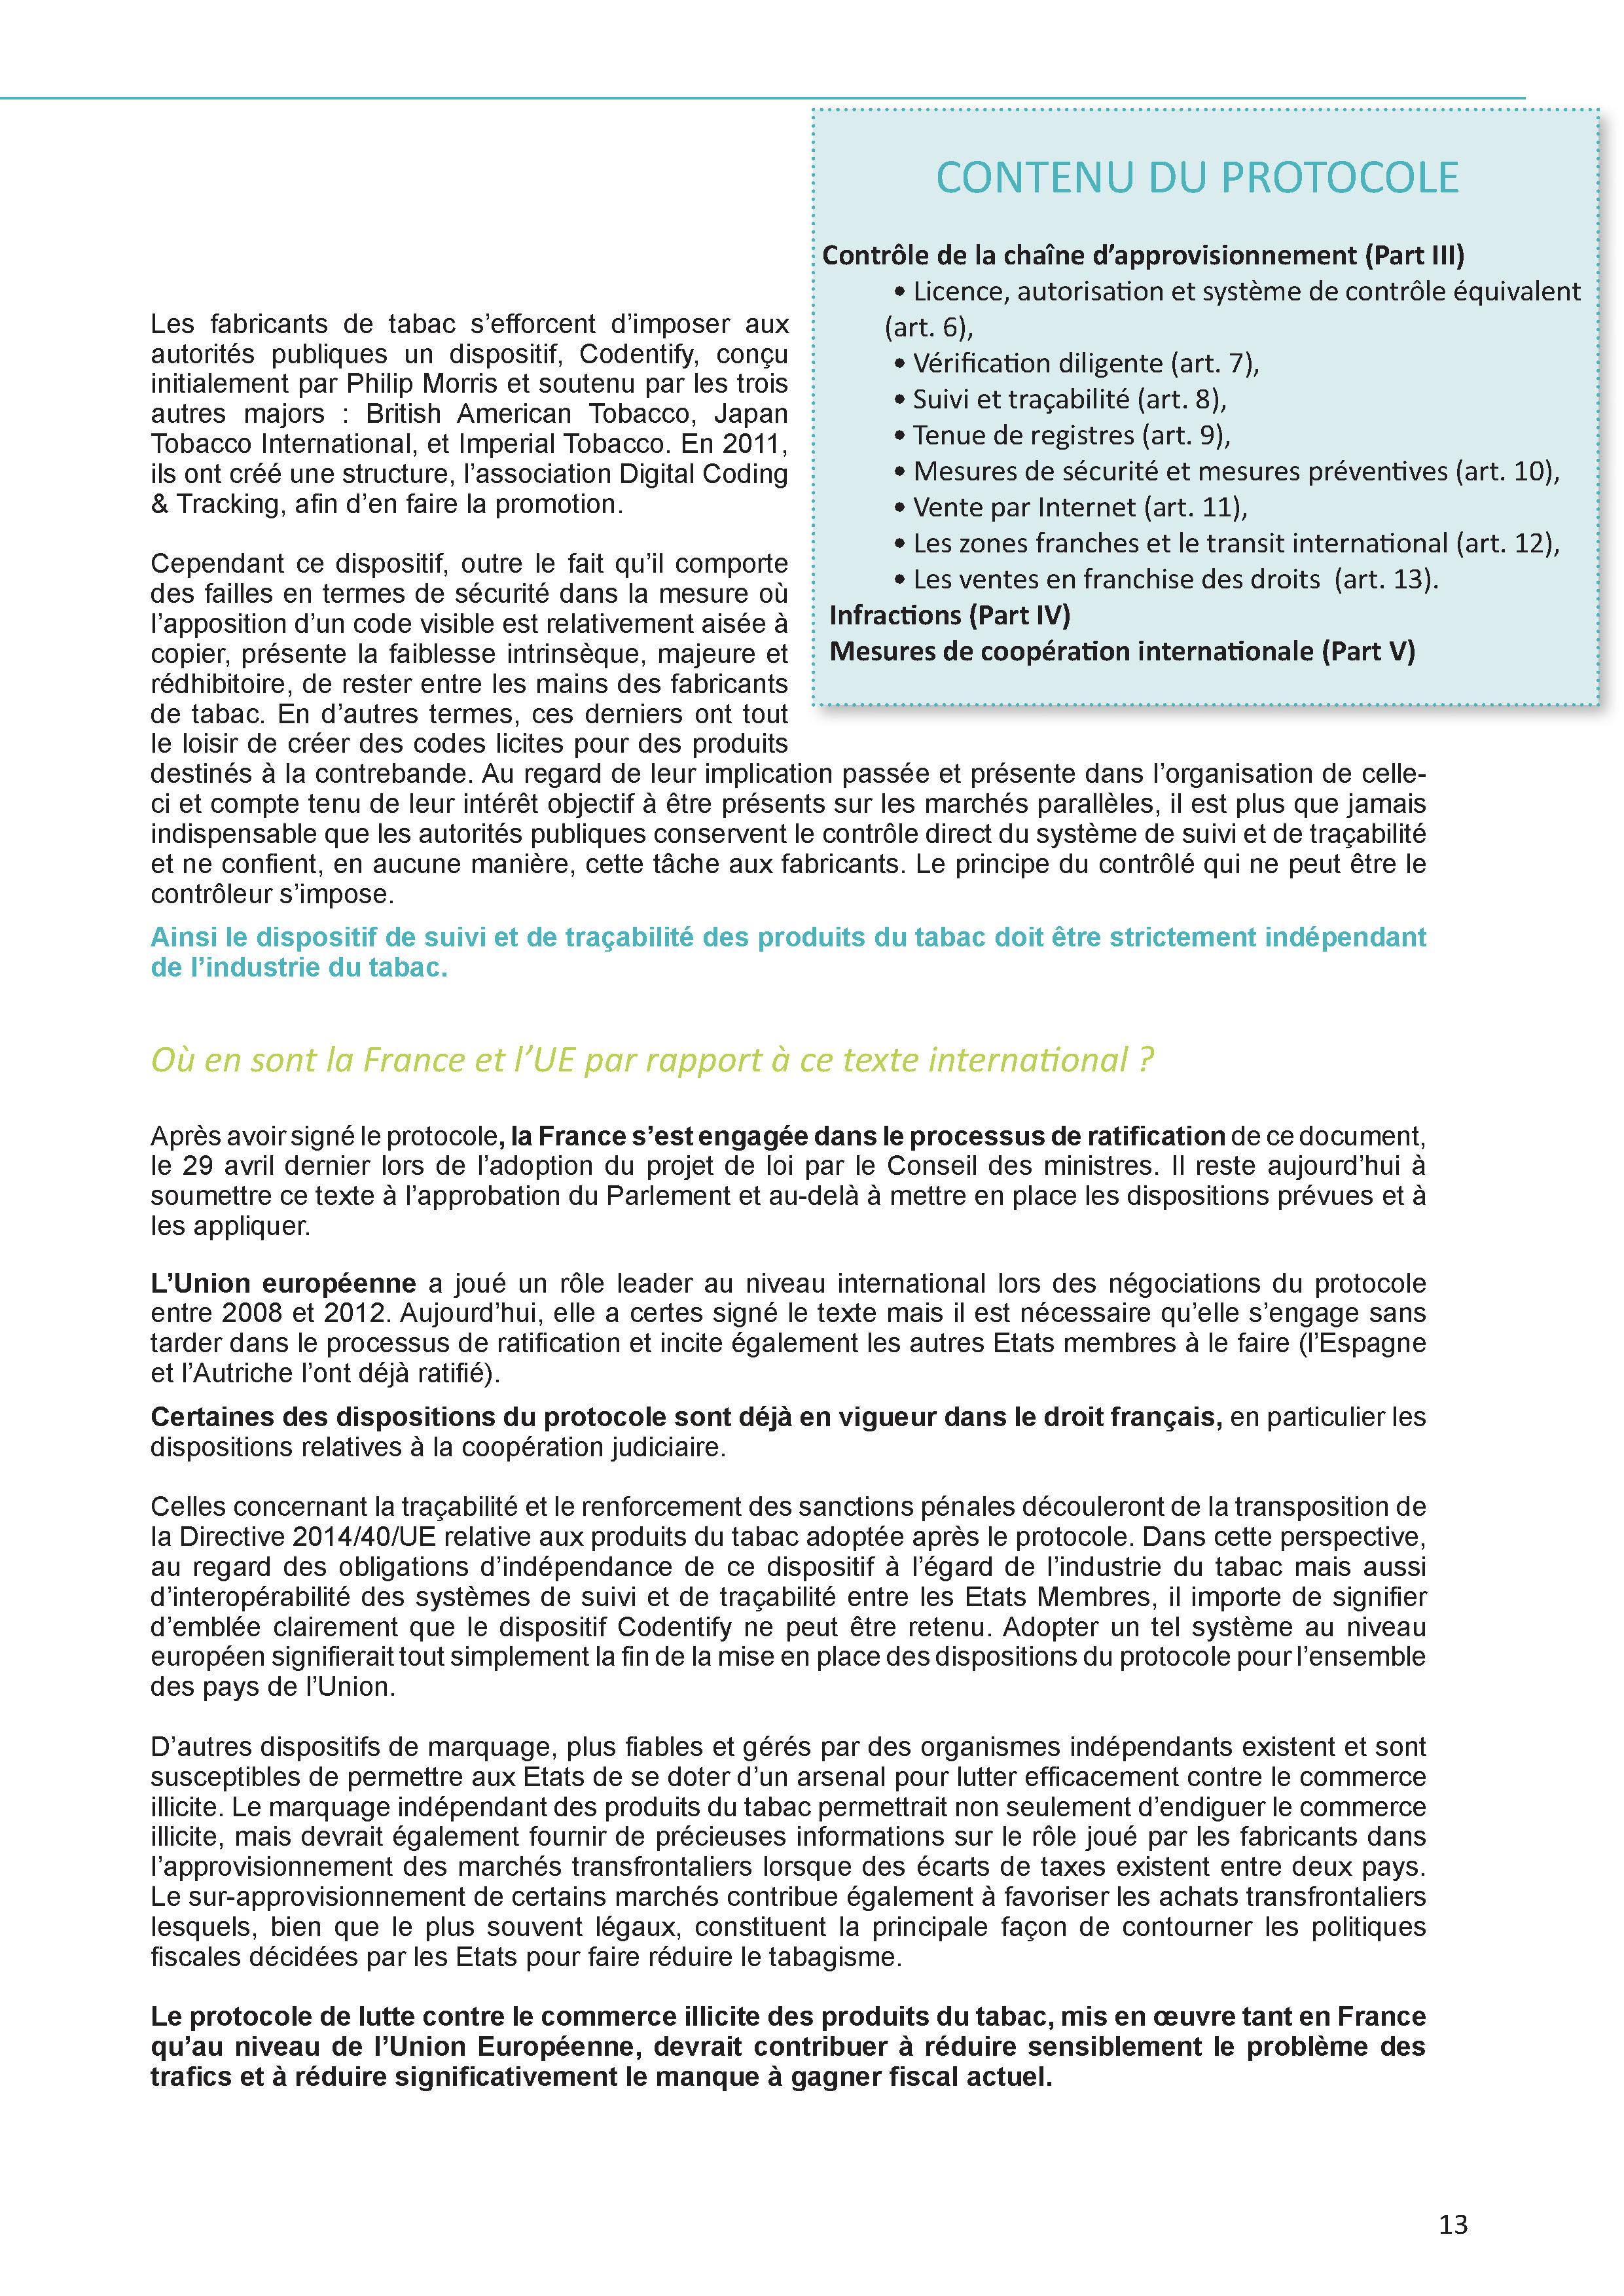 Alliance-DP_commerce-illicite-26mai2015_Page_13.jpg